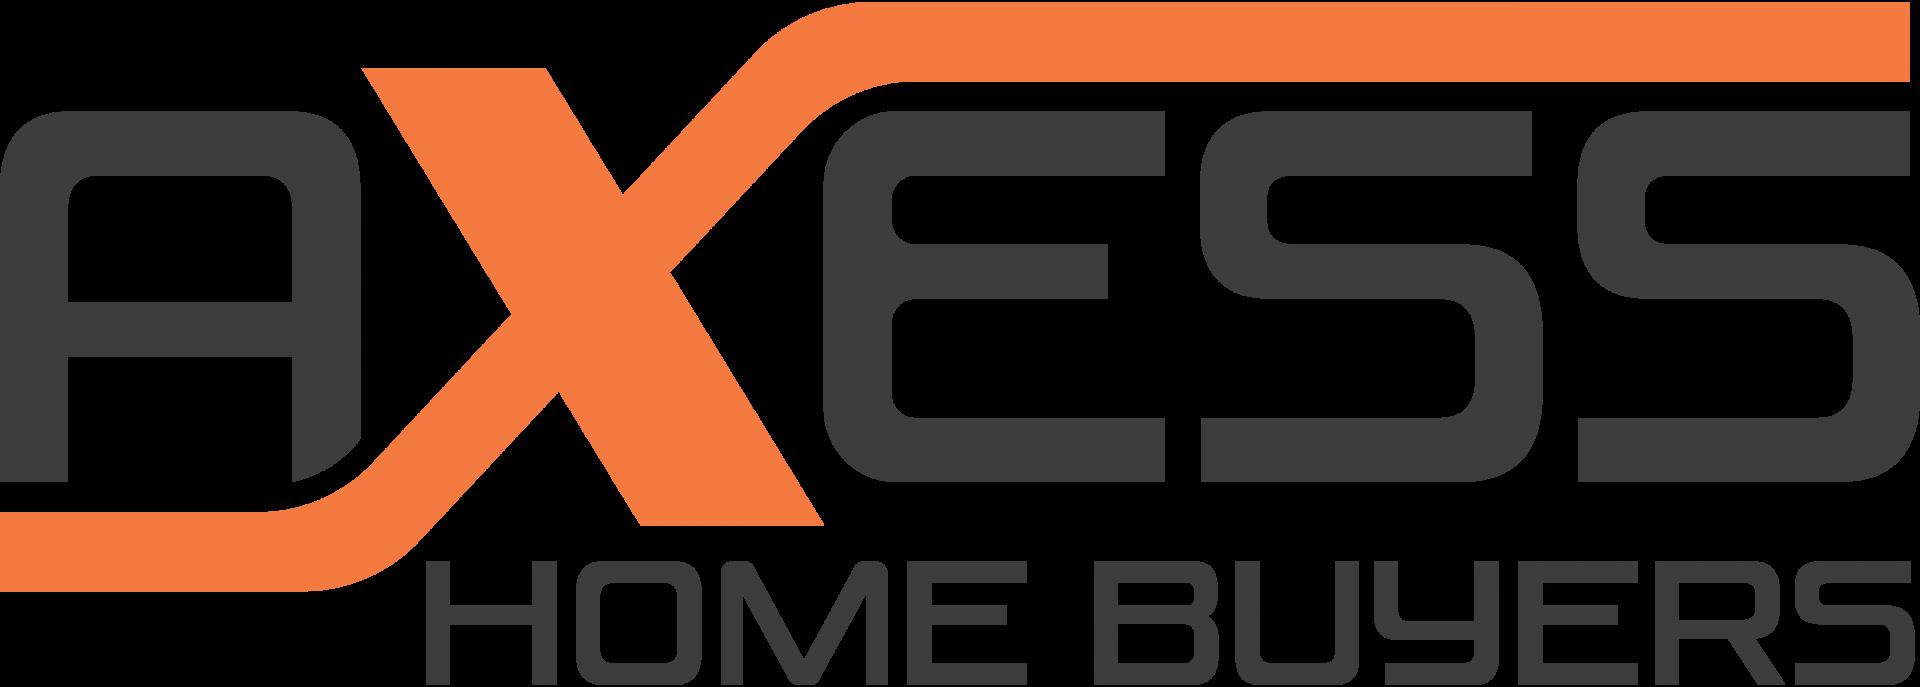 Axess Home Buyers logo